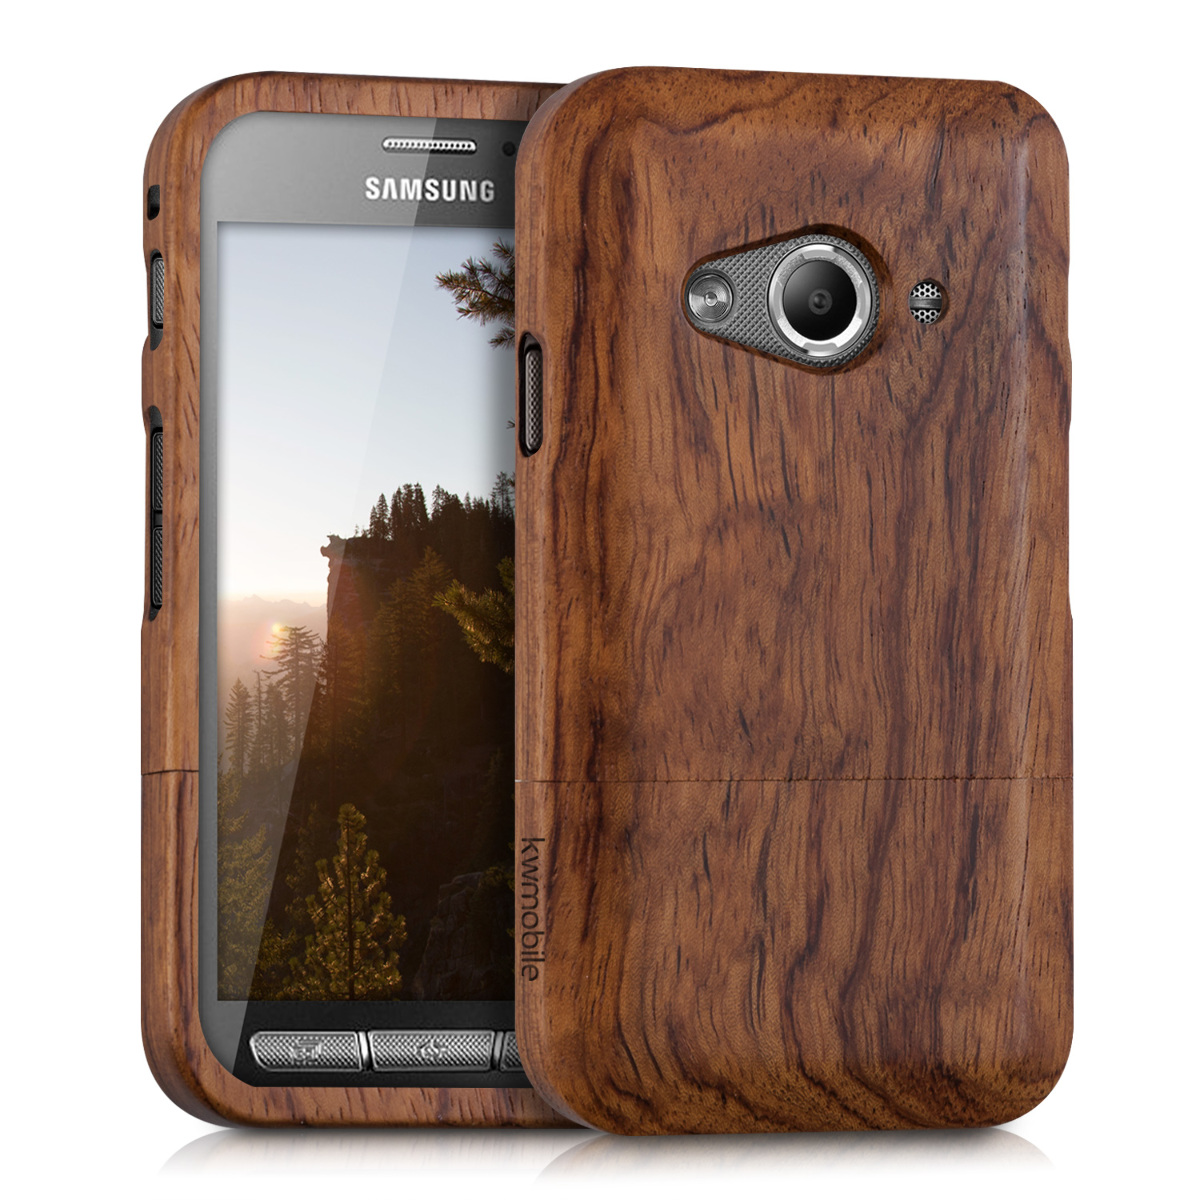 KW Σκληρή Ξύλινη Θήκη Samsung Galaxy Xcover 3 - (36095.05)